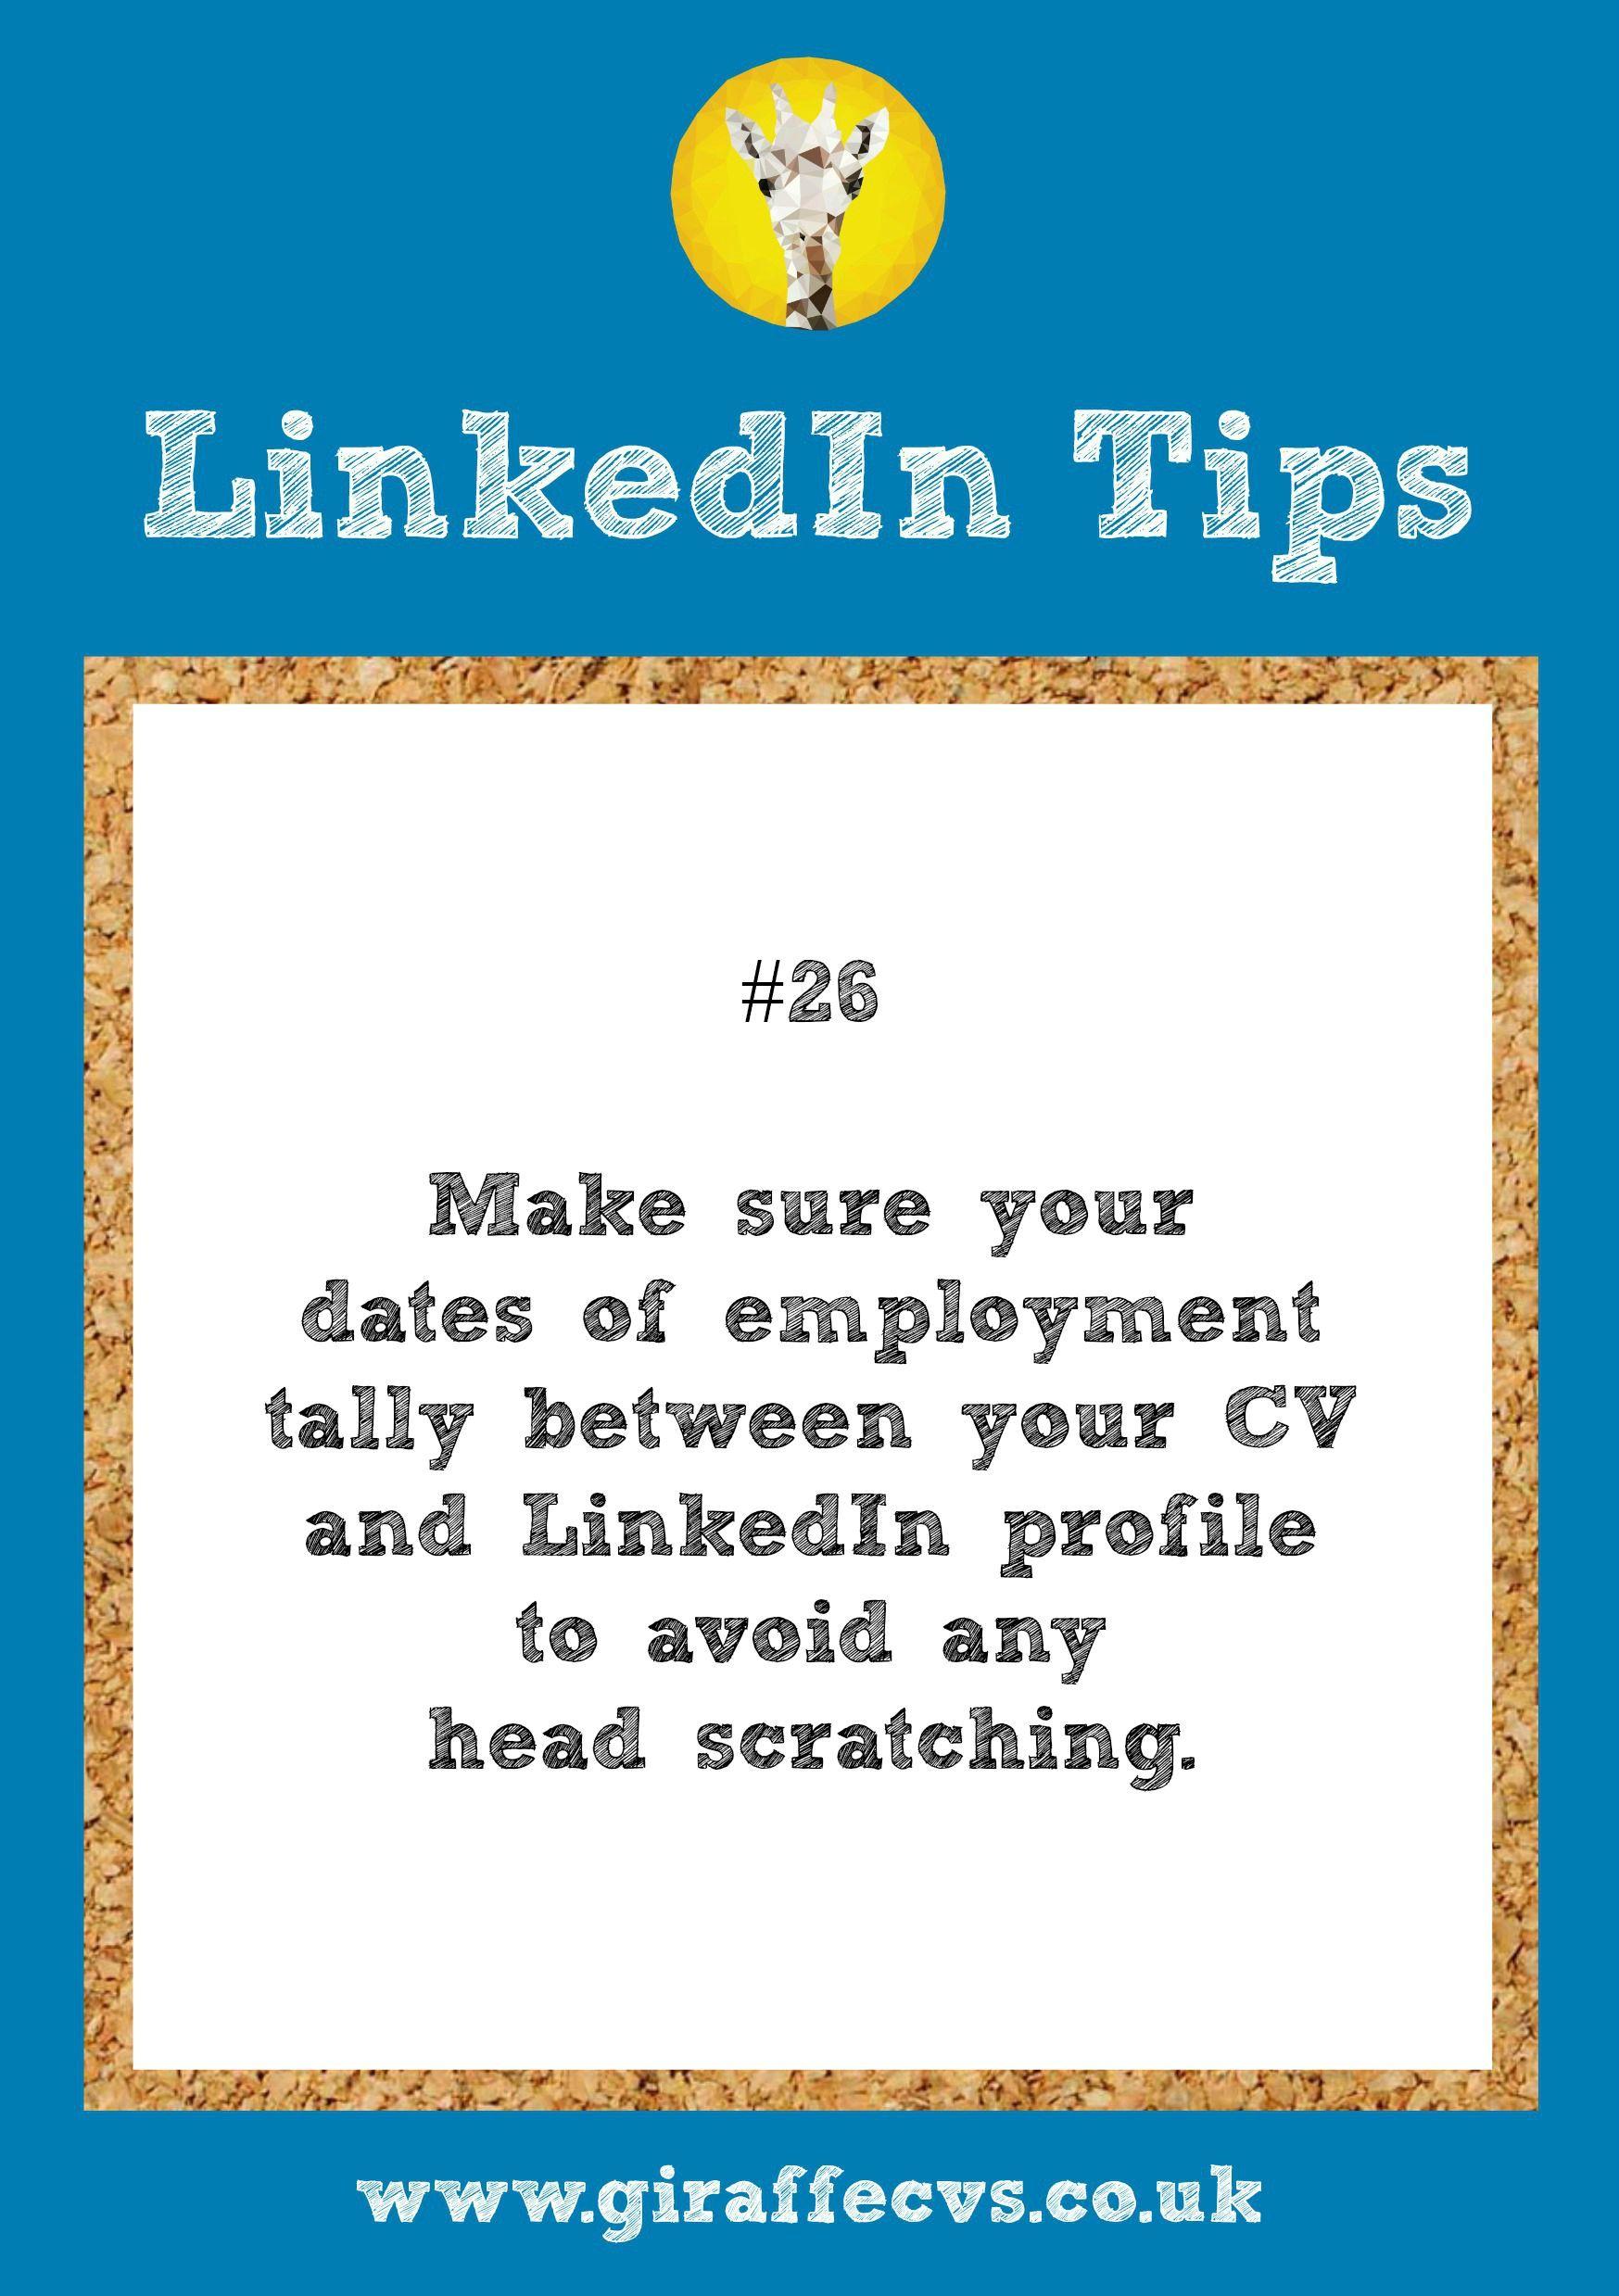 Pin by Giraffe CVs on Free LinkedIn Tips by Giraffe CVs